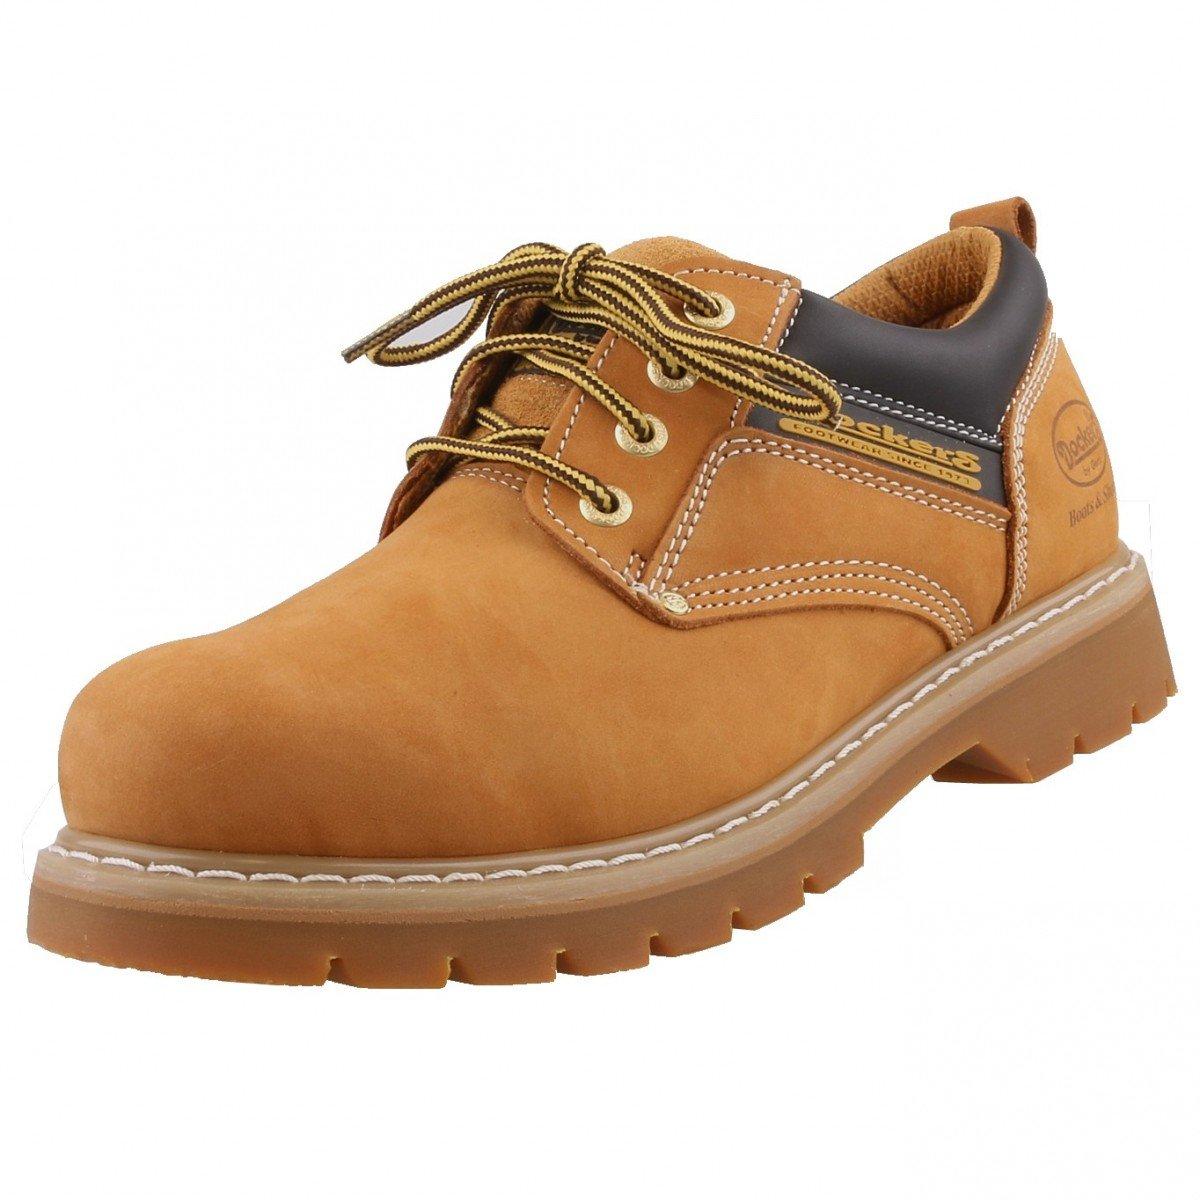 Dockers by Gerli Herrenschuhe Halbschuhe - Vier Farben, Schuhgröße Schuhgröße Schuhgröße EUR 43, Farbe Gelbtöne d93f5f